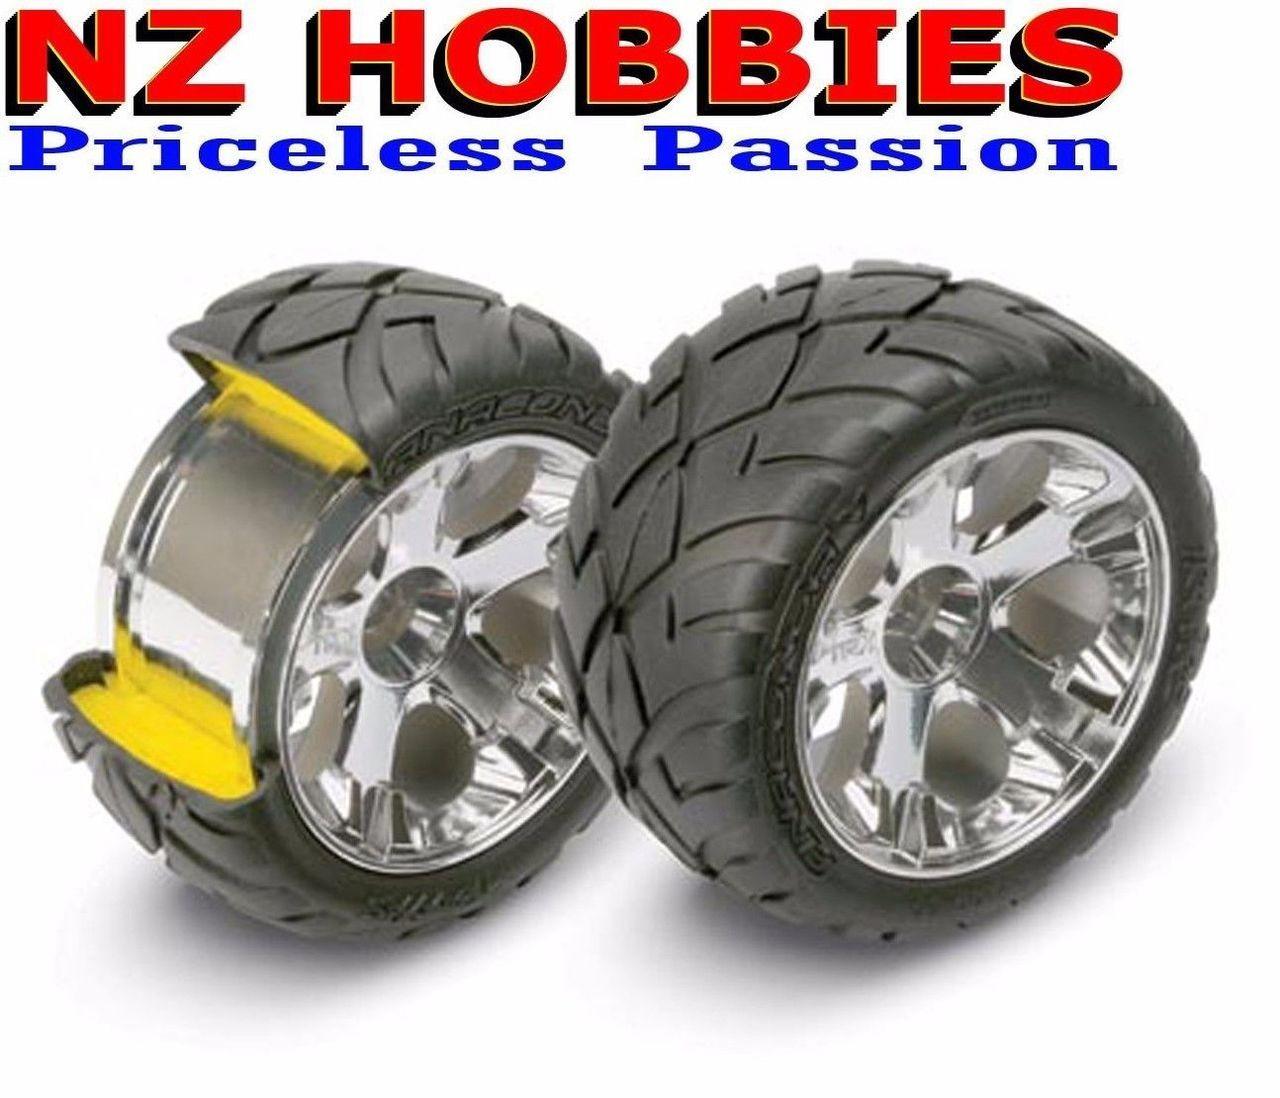 Toys & Hobbies Radio Control & Control Line Traxxas 5577A Front All-Star 2.8'' BK Chrome Wheels Nitro Stampede Rustler Jato